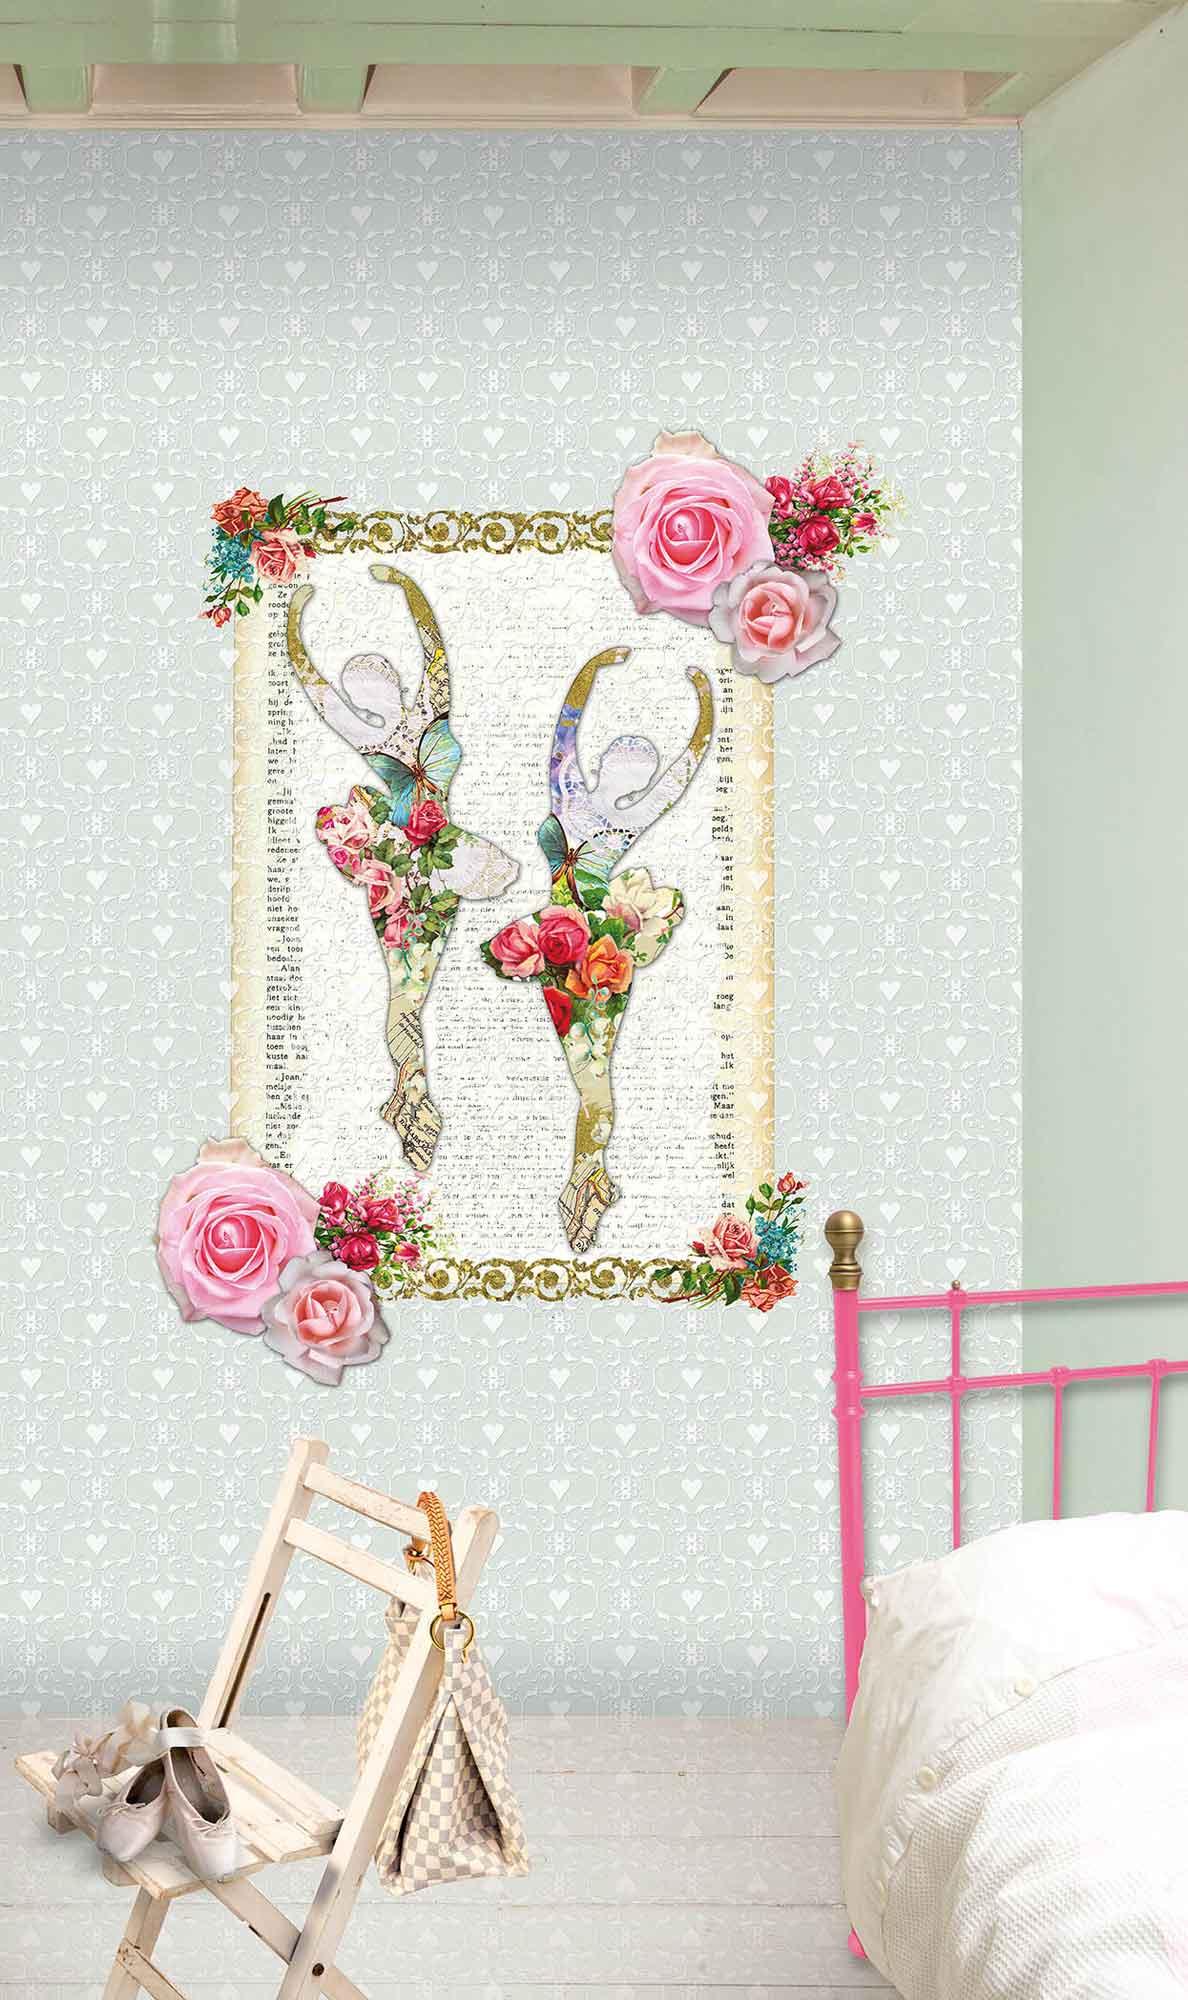 Kinderzimmer u.a. Fototapeten Bildtapeten zum online kaufen ...